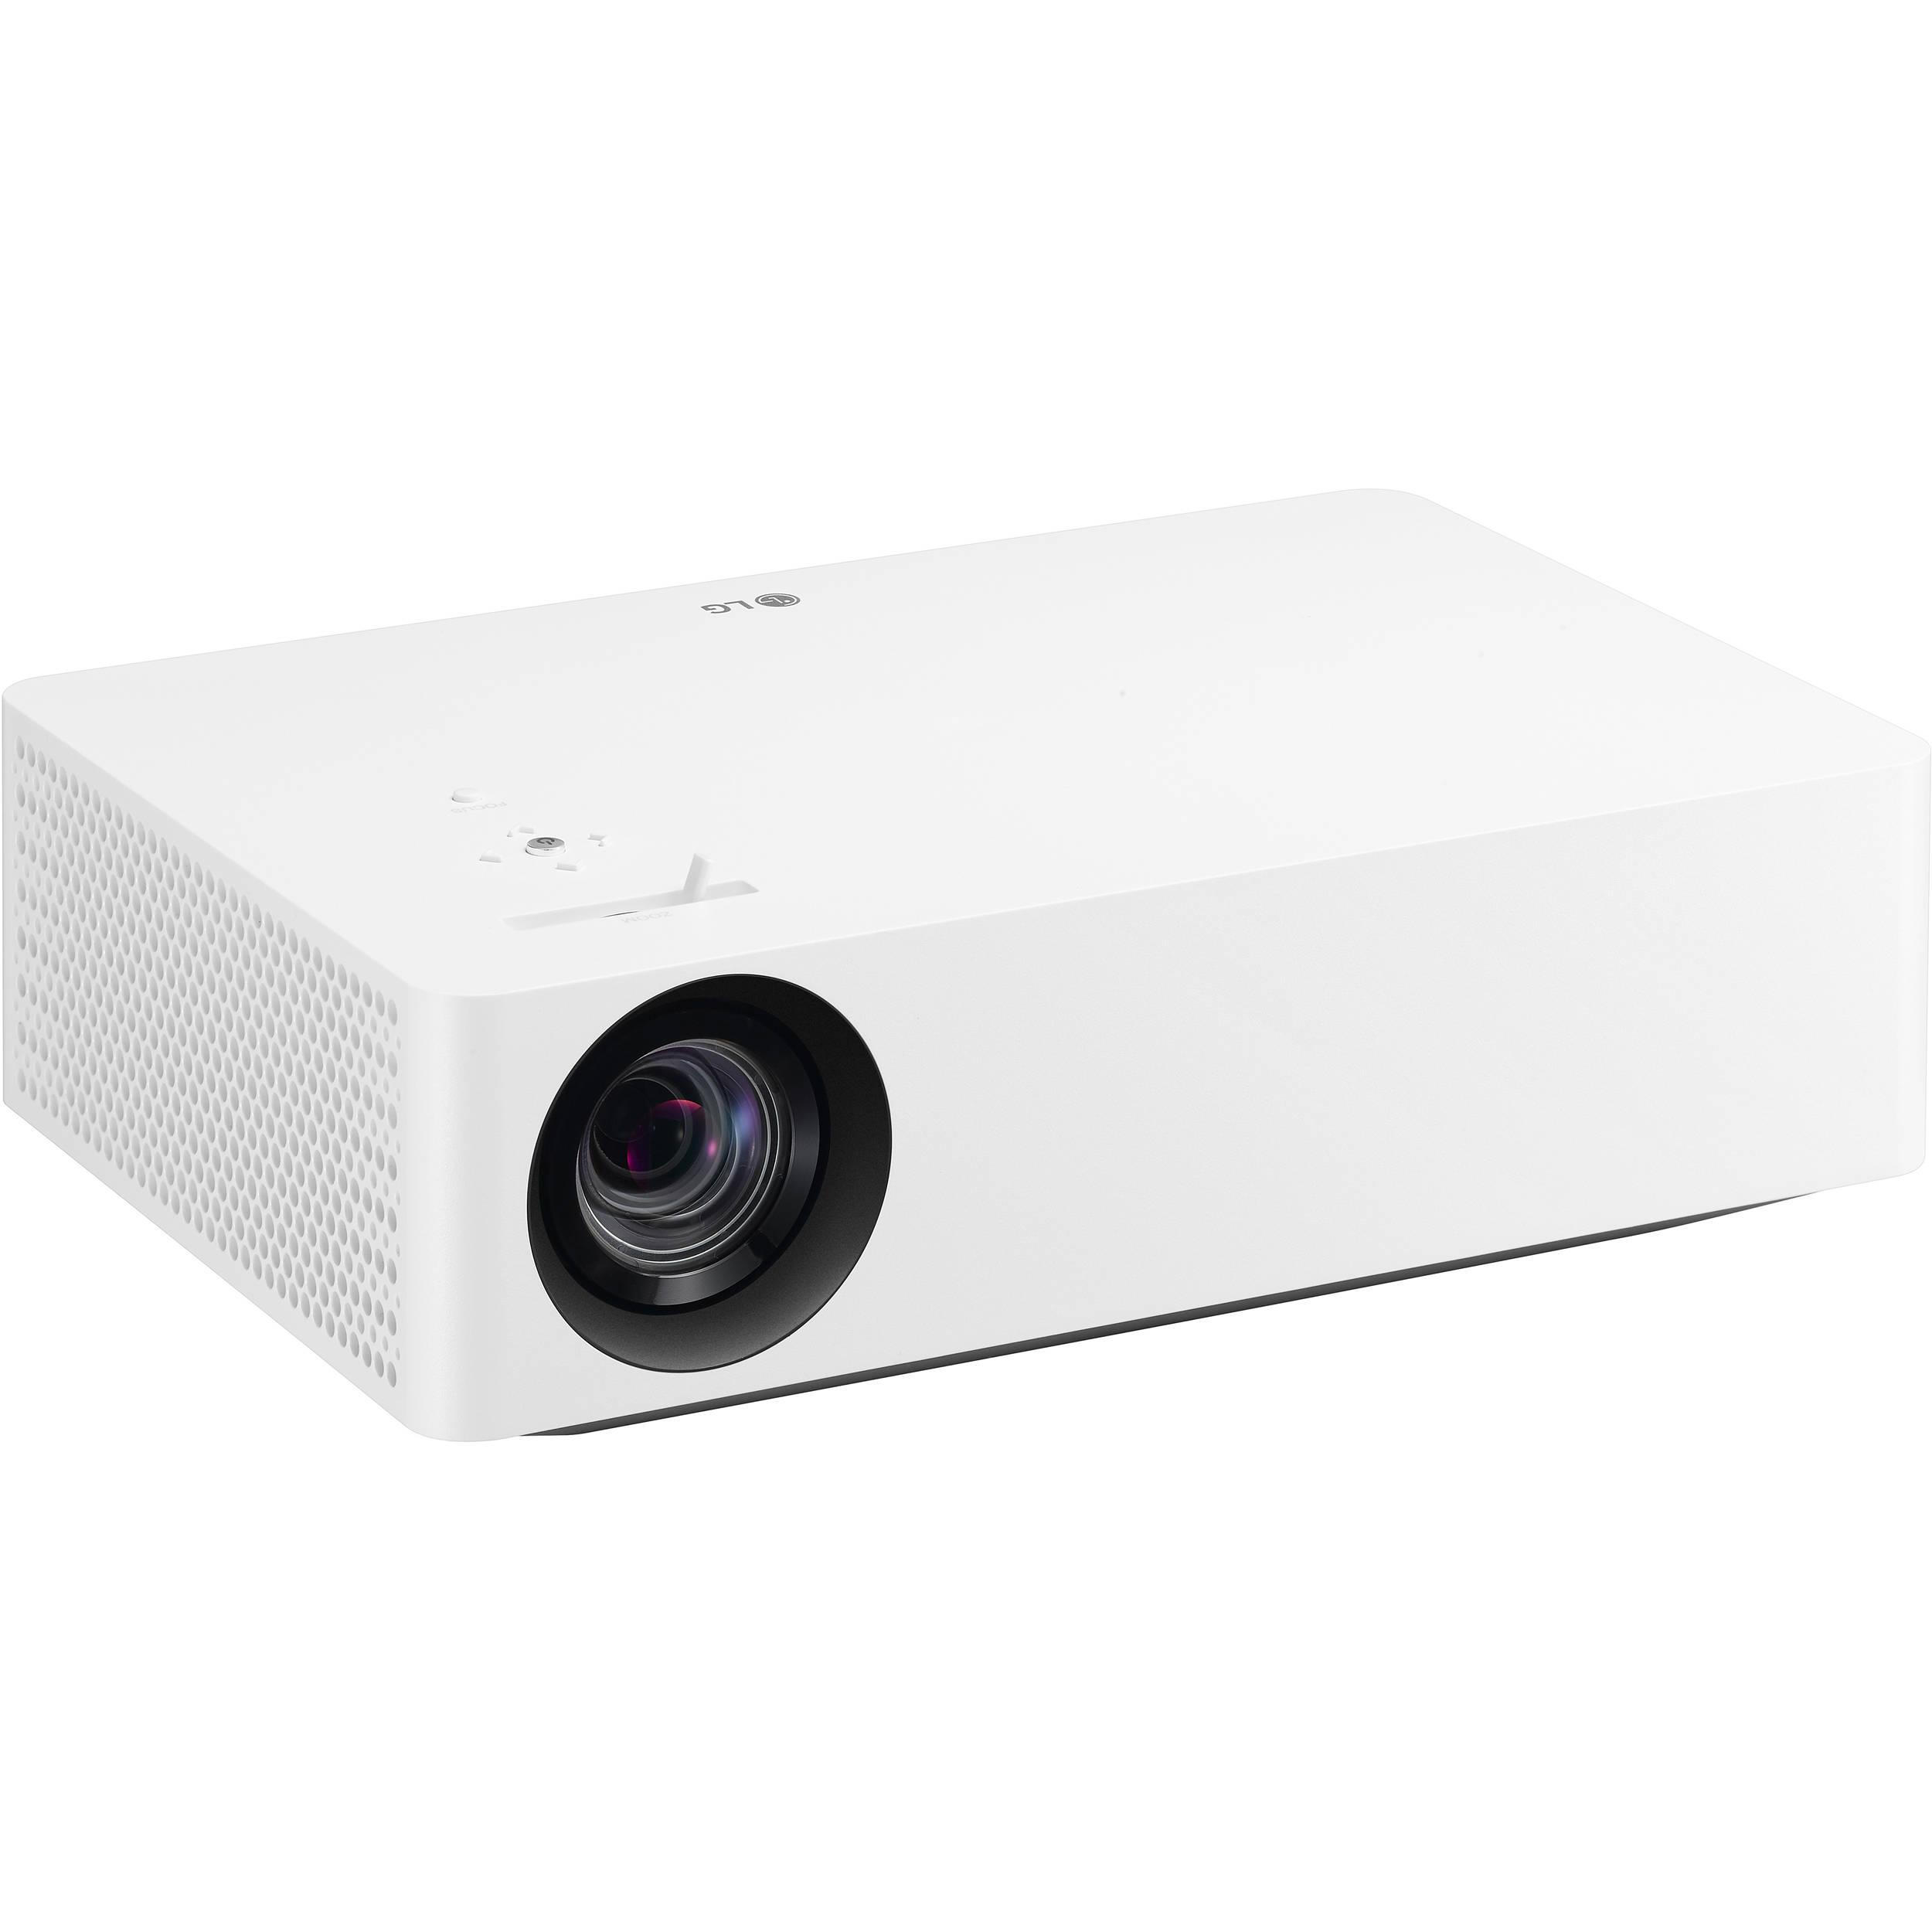 LG CineBeam HU70LA HDR XPR 4K UHD DLP Home Theater Projector